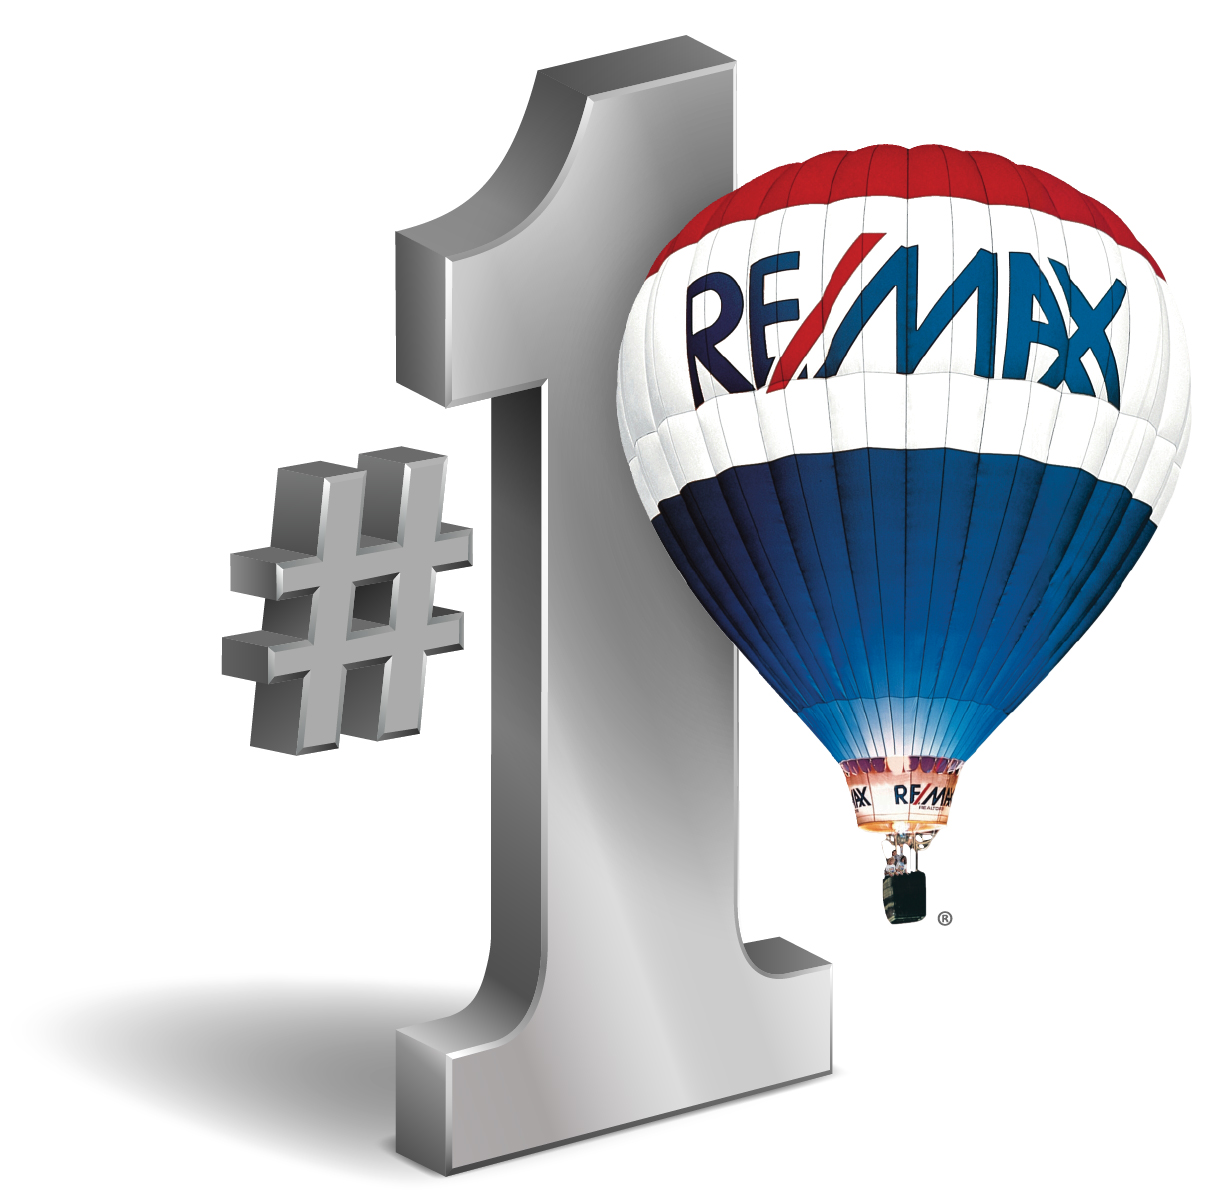 RE/MAX Results Sandy Snyder